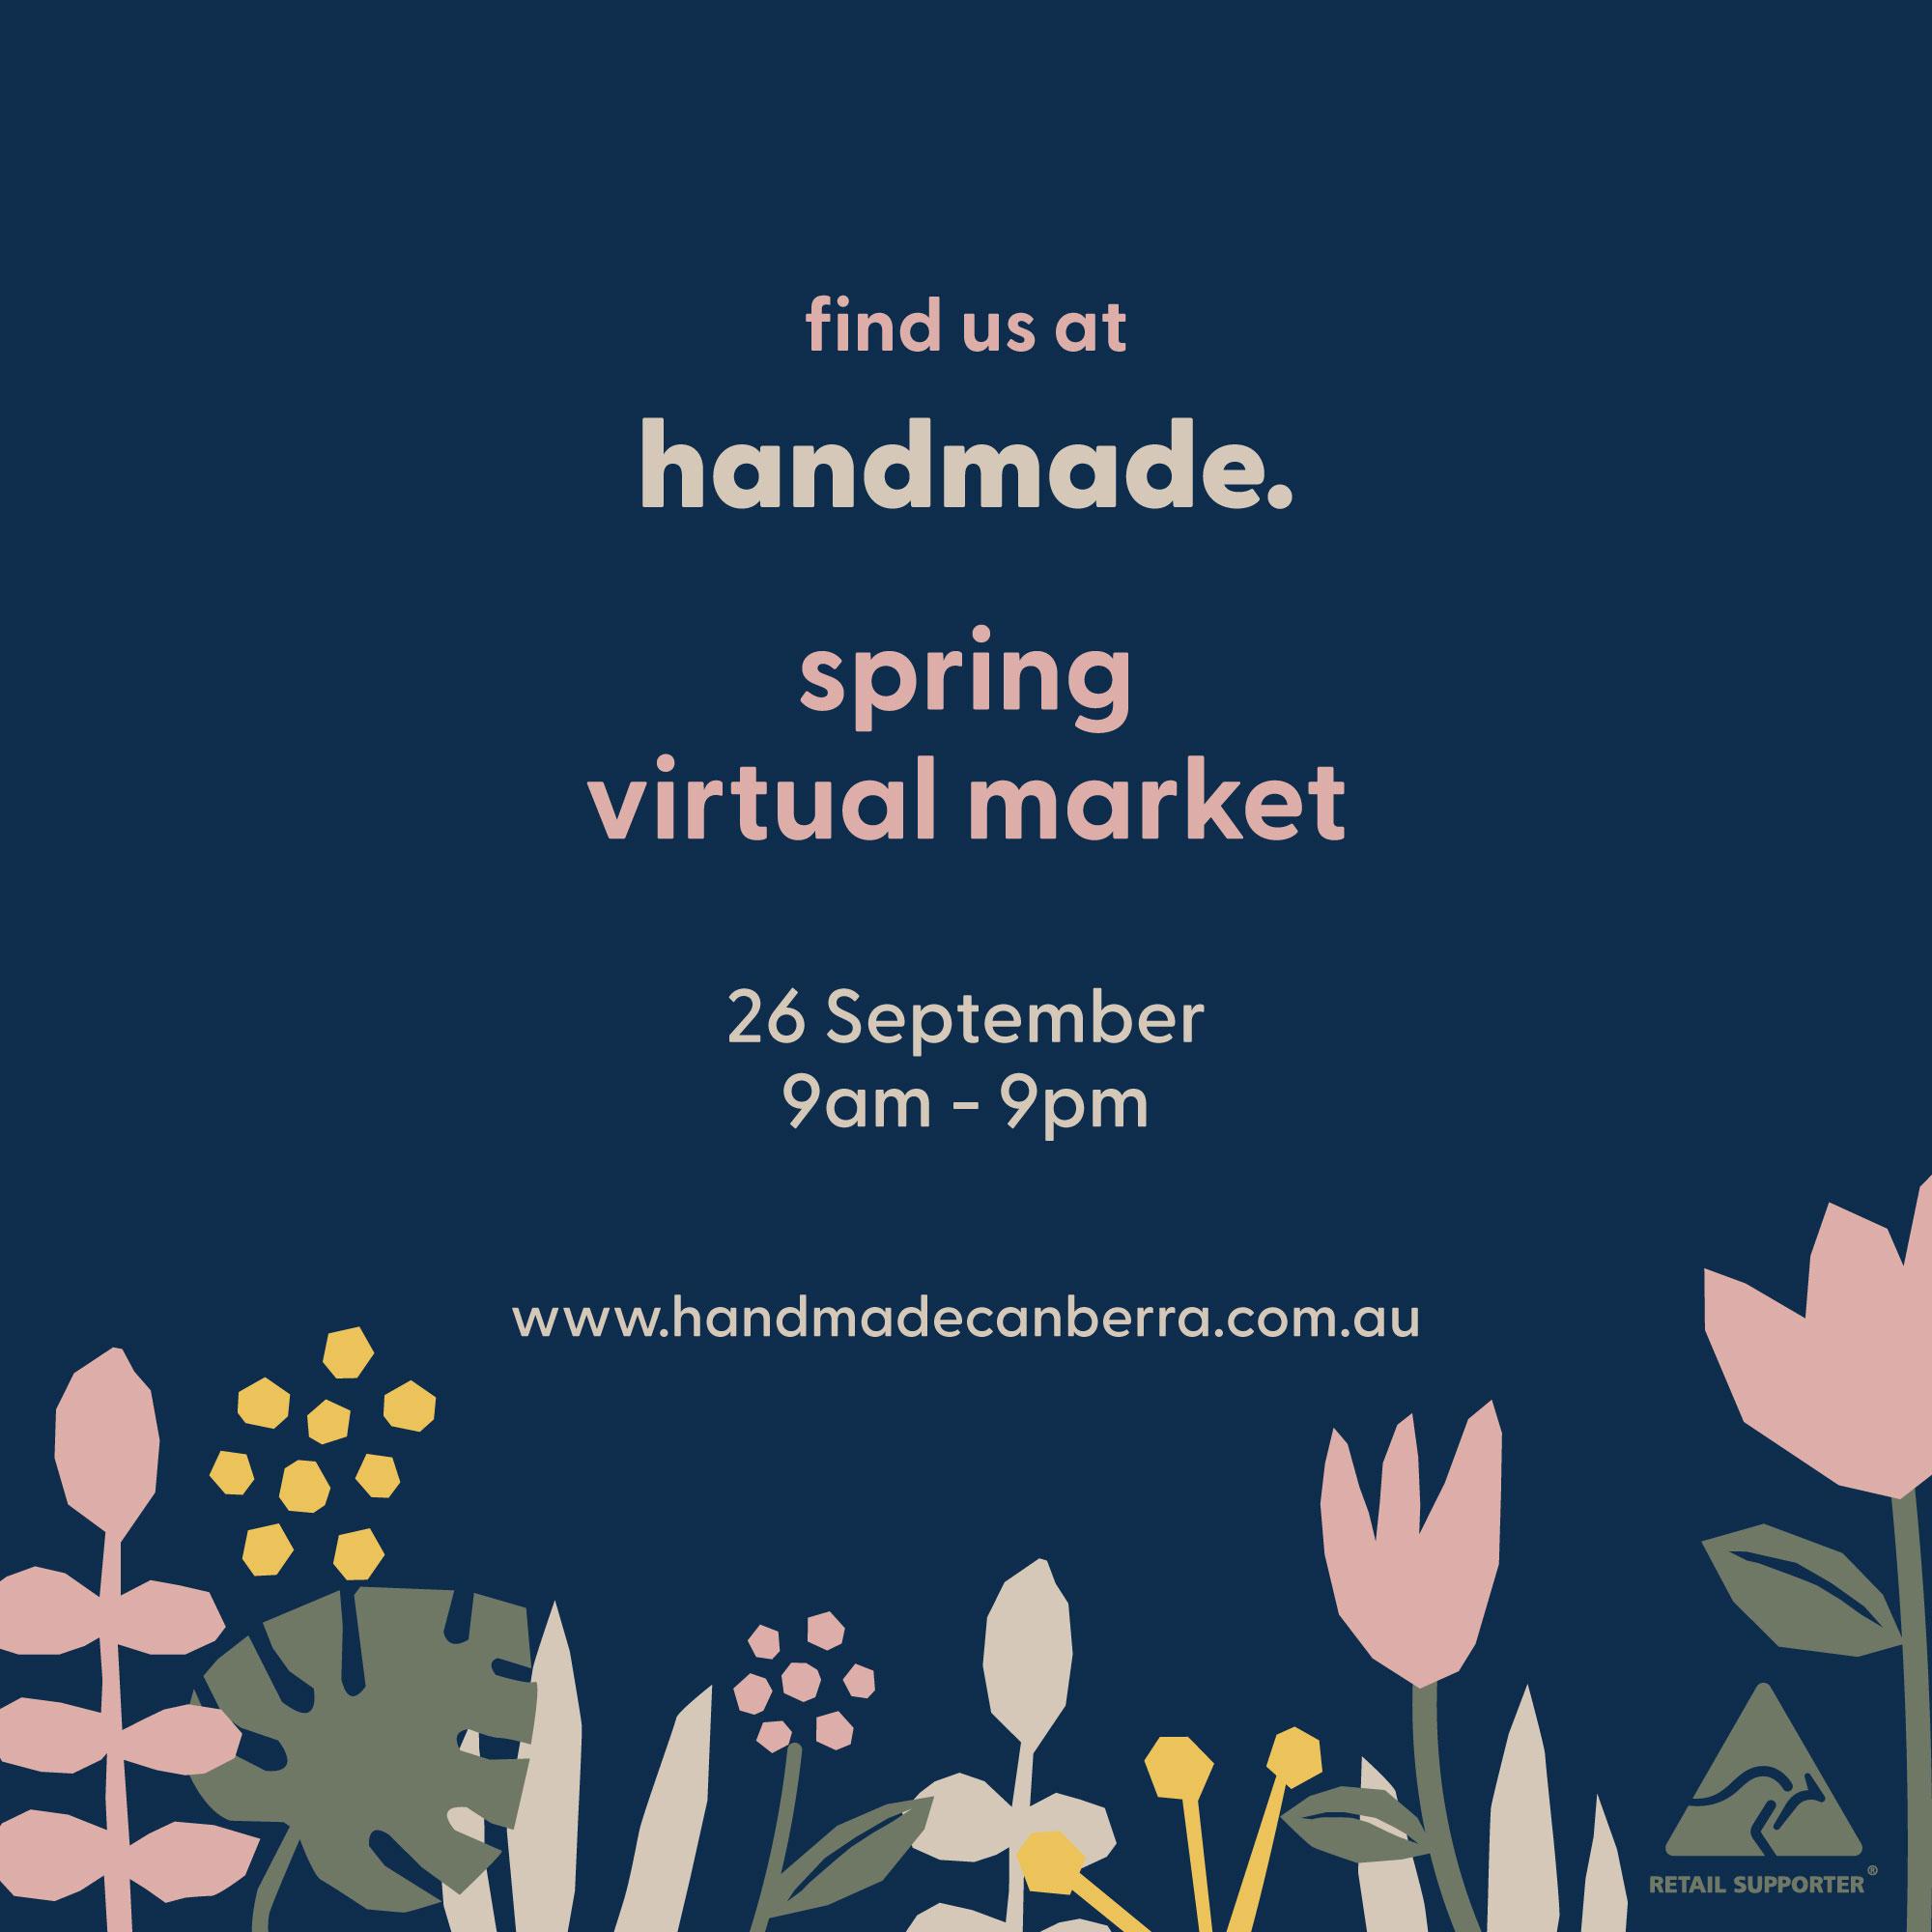 Handmade Canberra Spring Virtual Market 2020 | Homelea Lass Contemporary Crochet